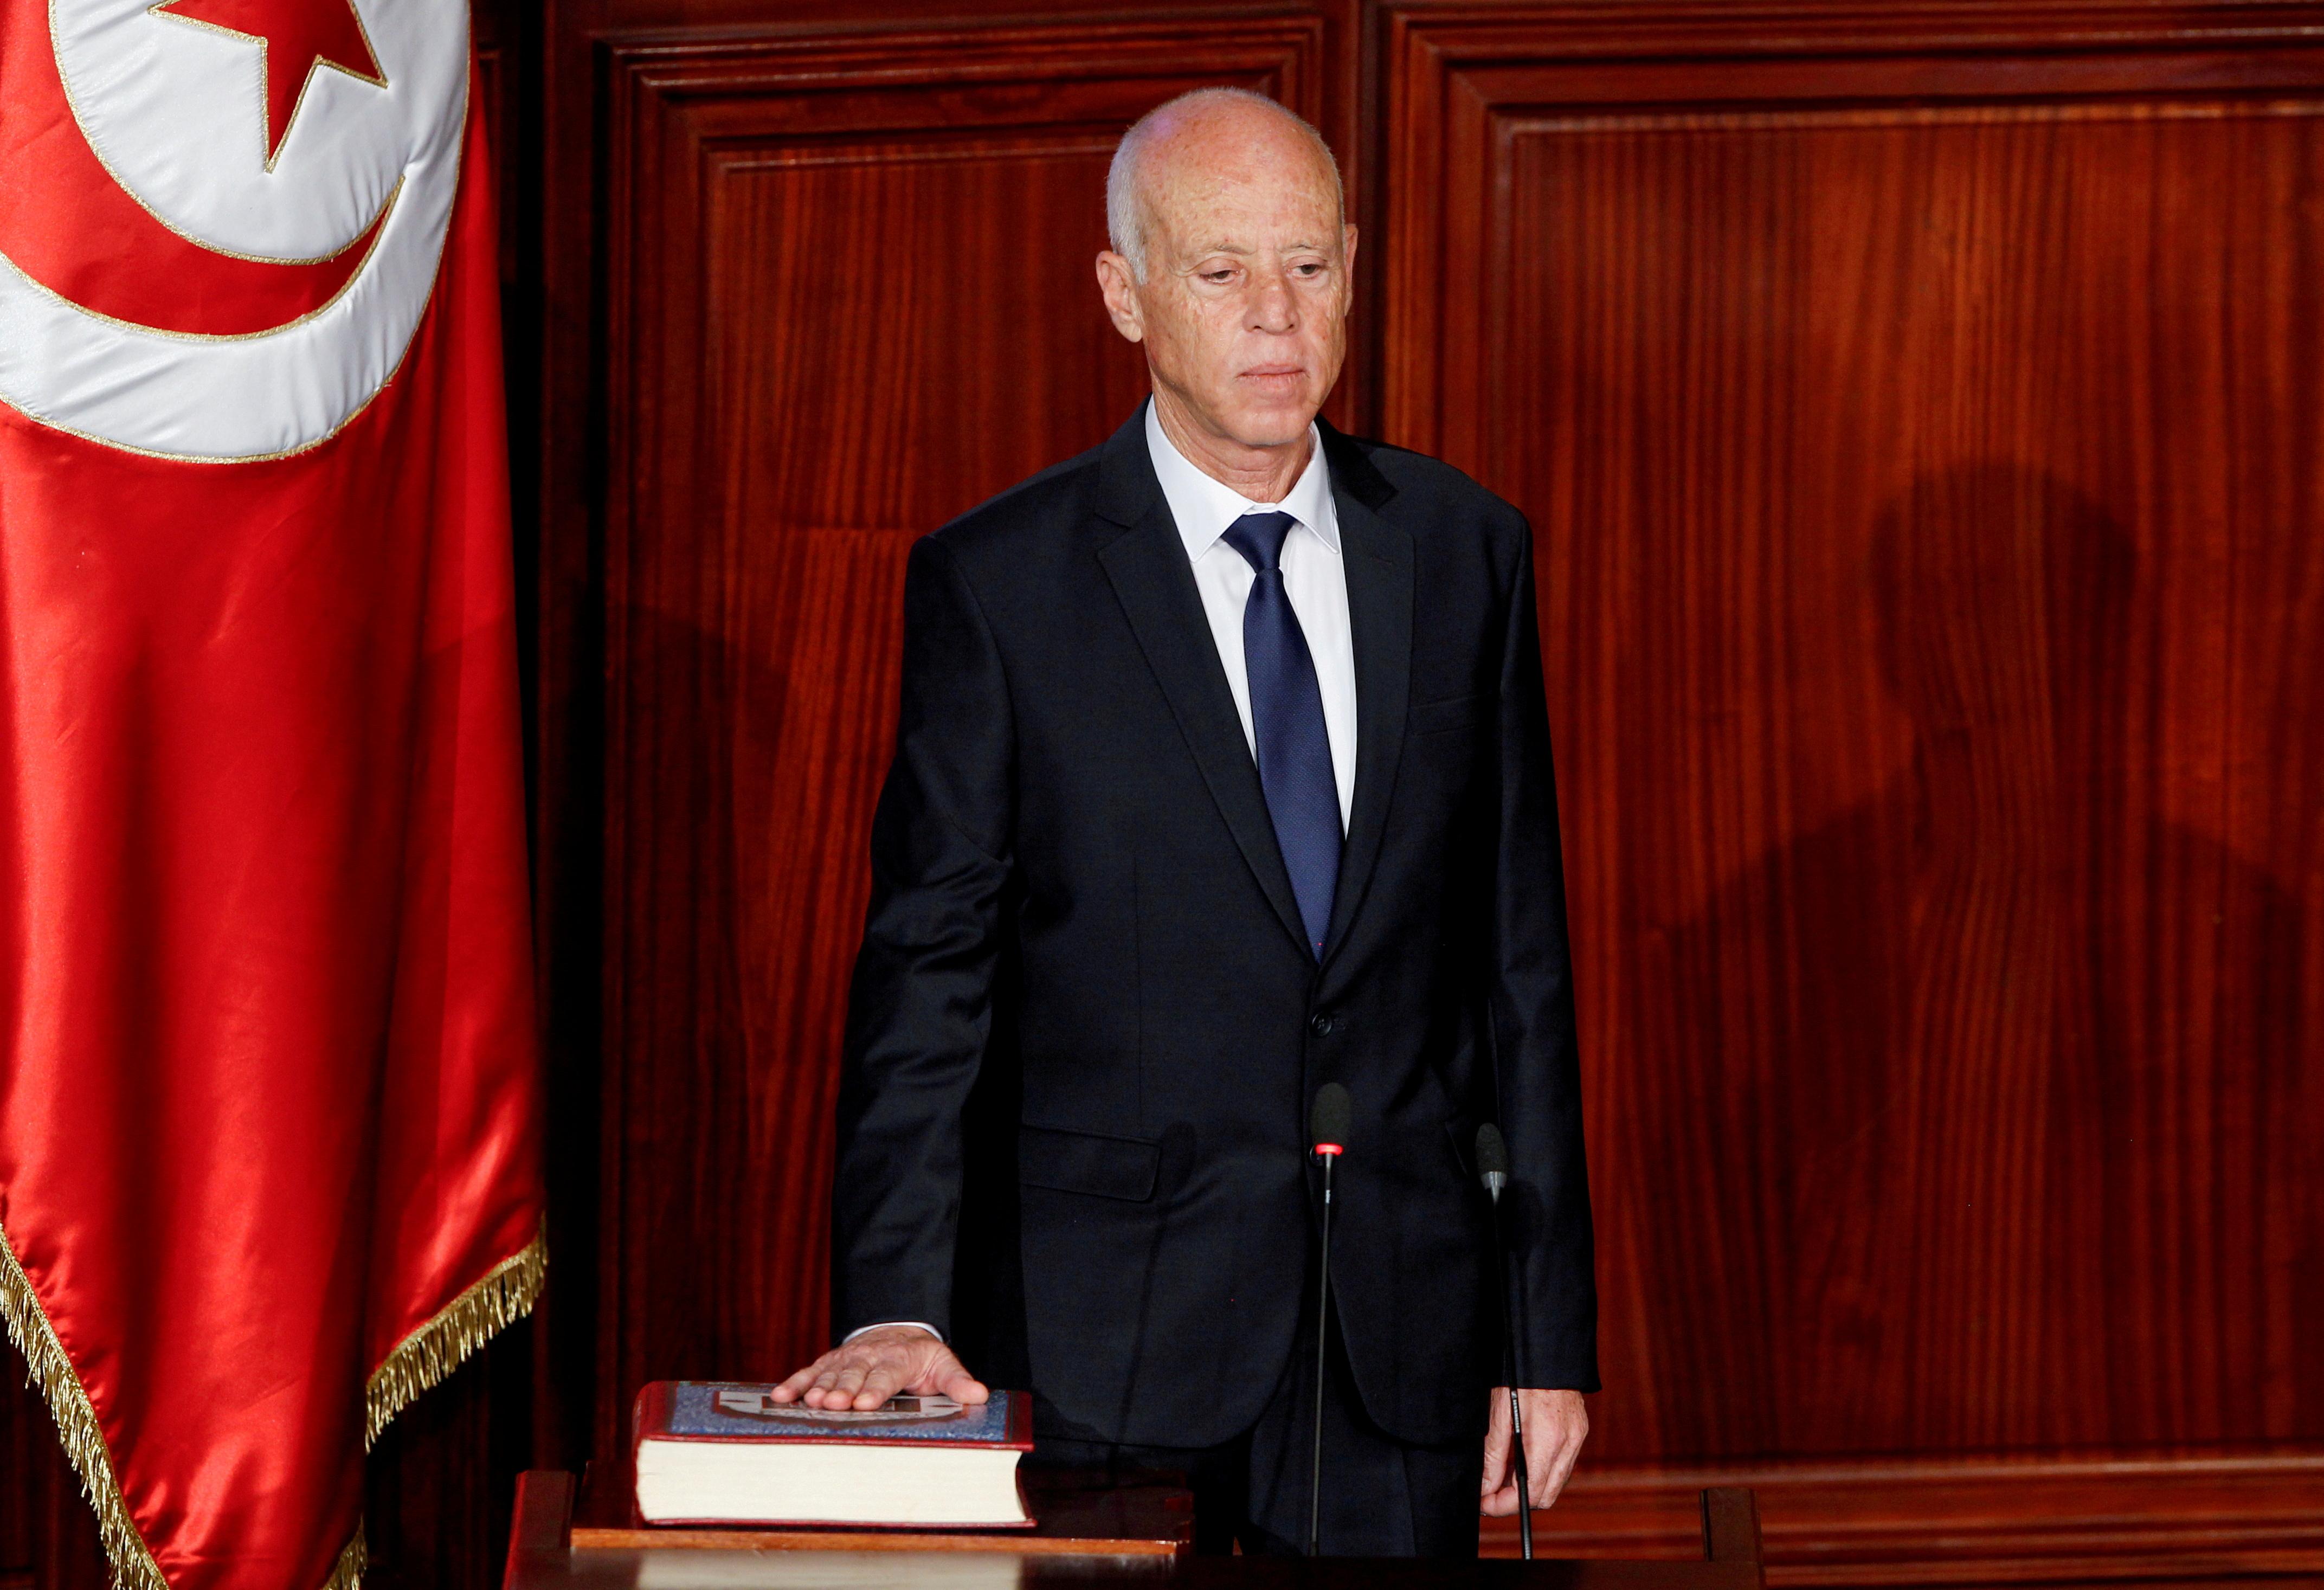 Tunisian President Kais Saied takes the oath of office in Tunis, Tunisia, October 23, 2019. REUTERS/Zoubeir Souissi/File Photo//File Photo